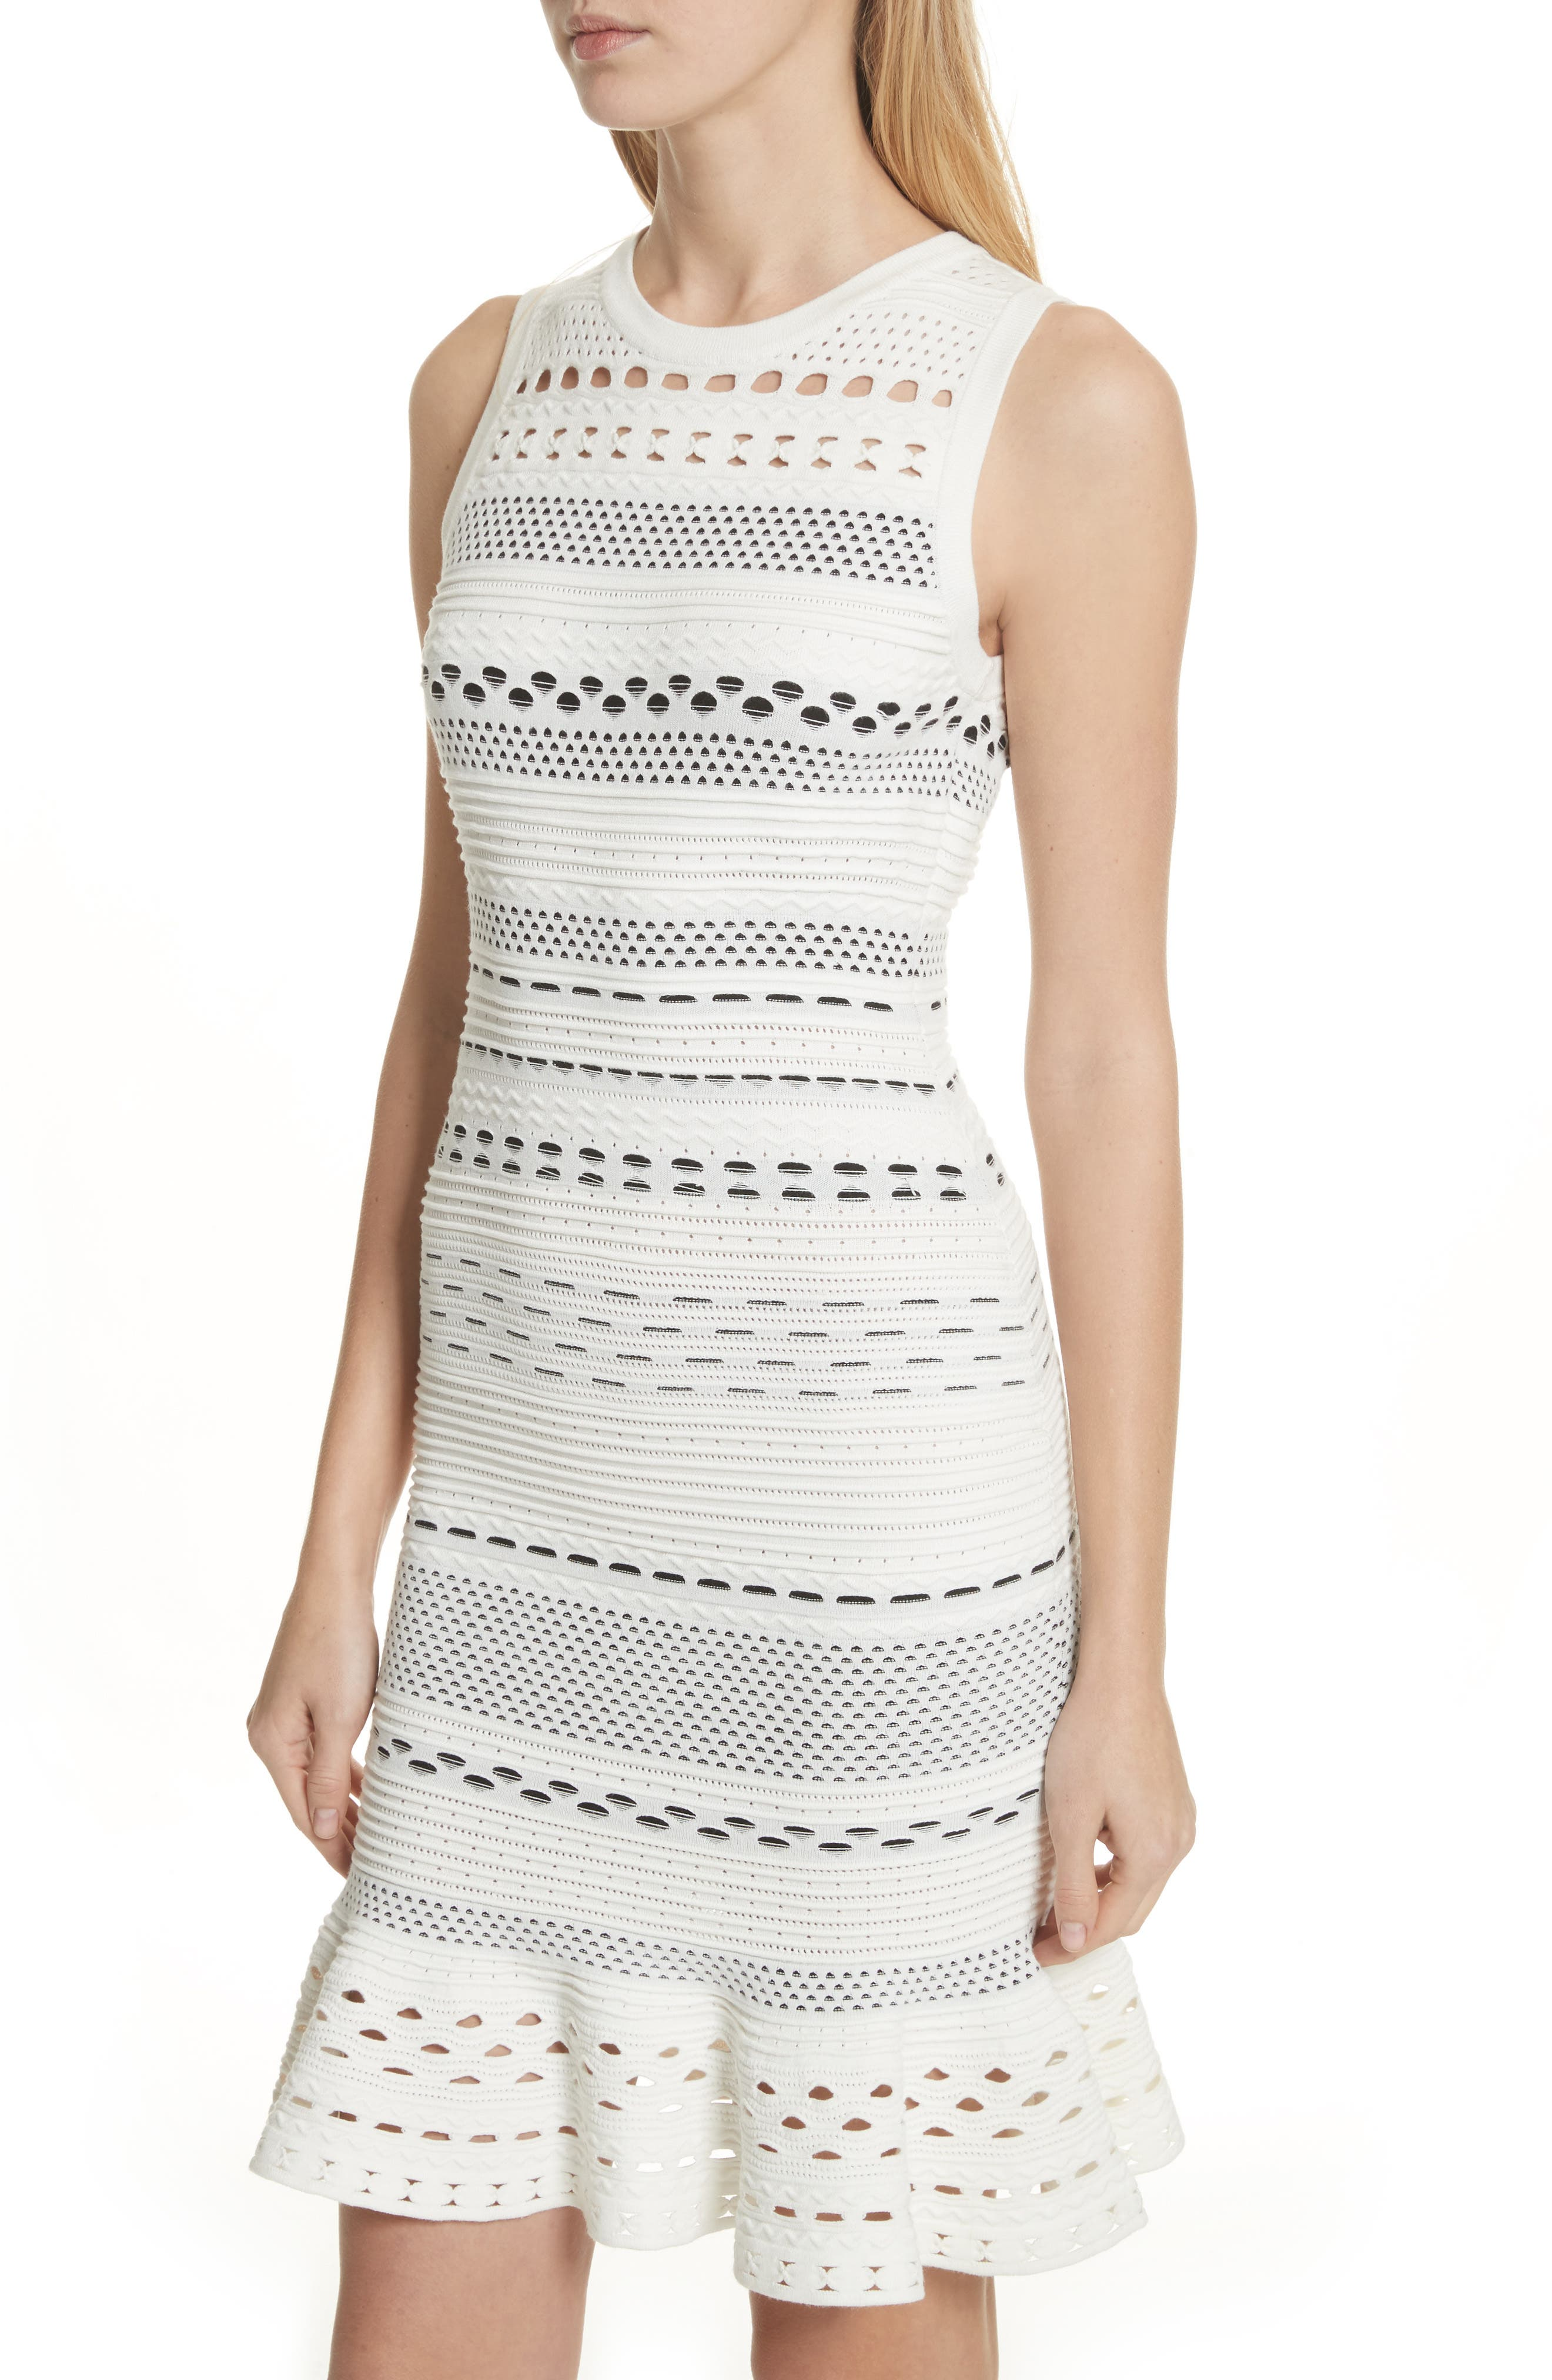 Cutout Lace Knit Dress,                             Alternate thumbnail 4, color,                             White/ Black